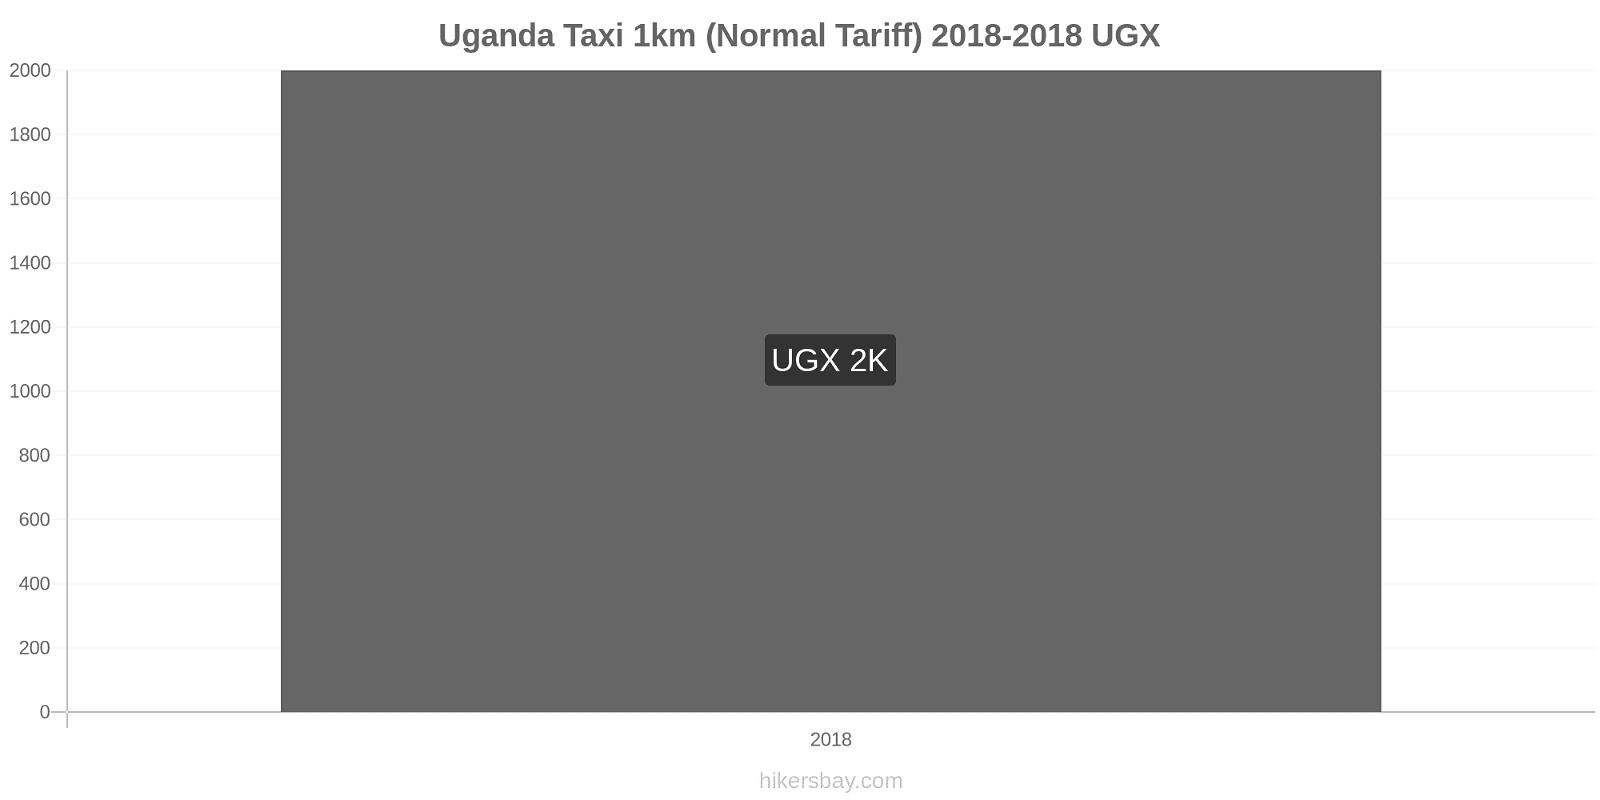 Uganda price changes Taxi 1km (Normal Tariff) hikersbay.com